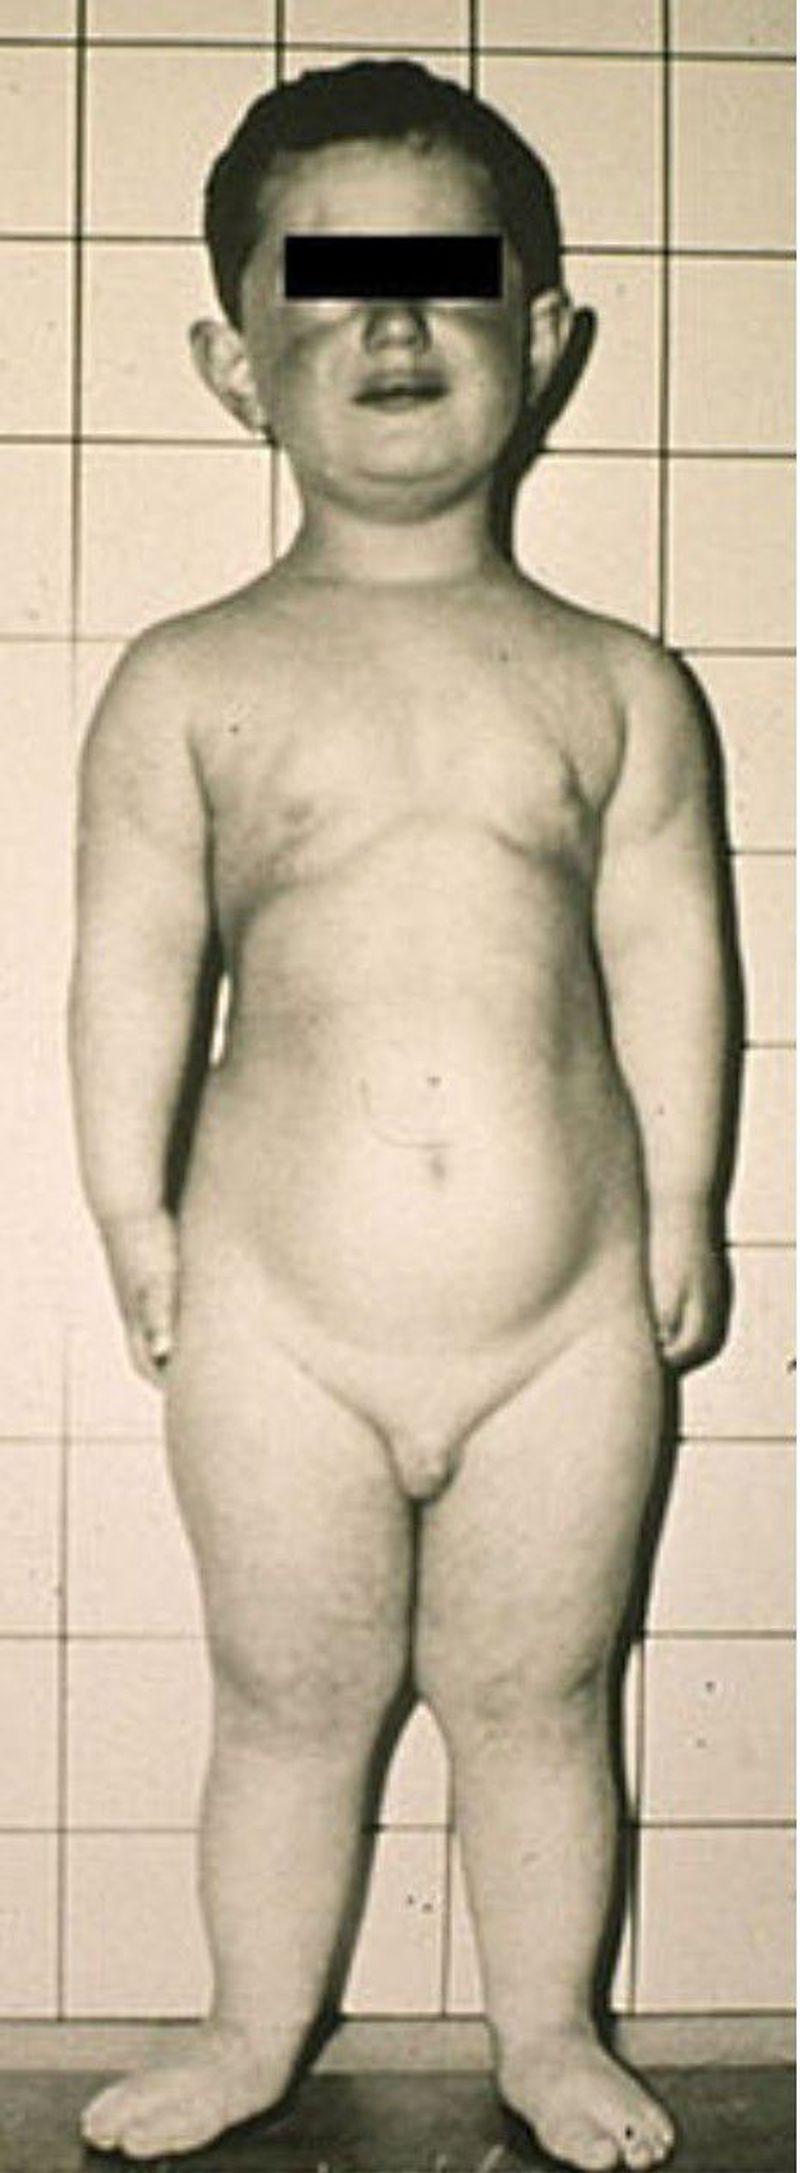 Ellis van creveld syndrome aka chondroectodermal dysplasia